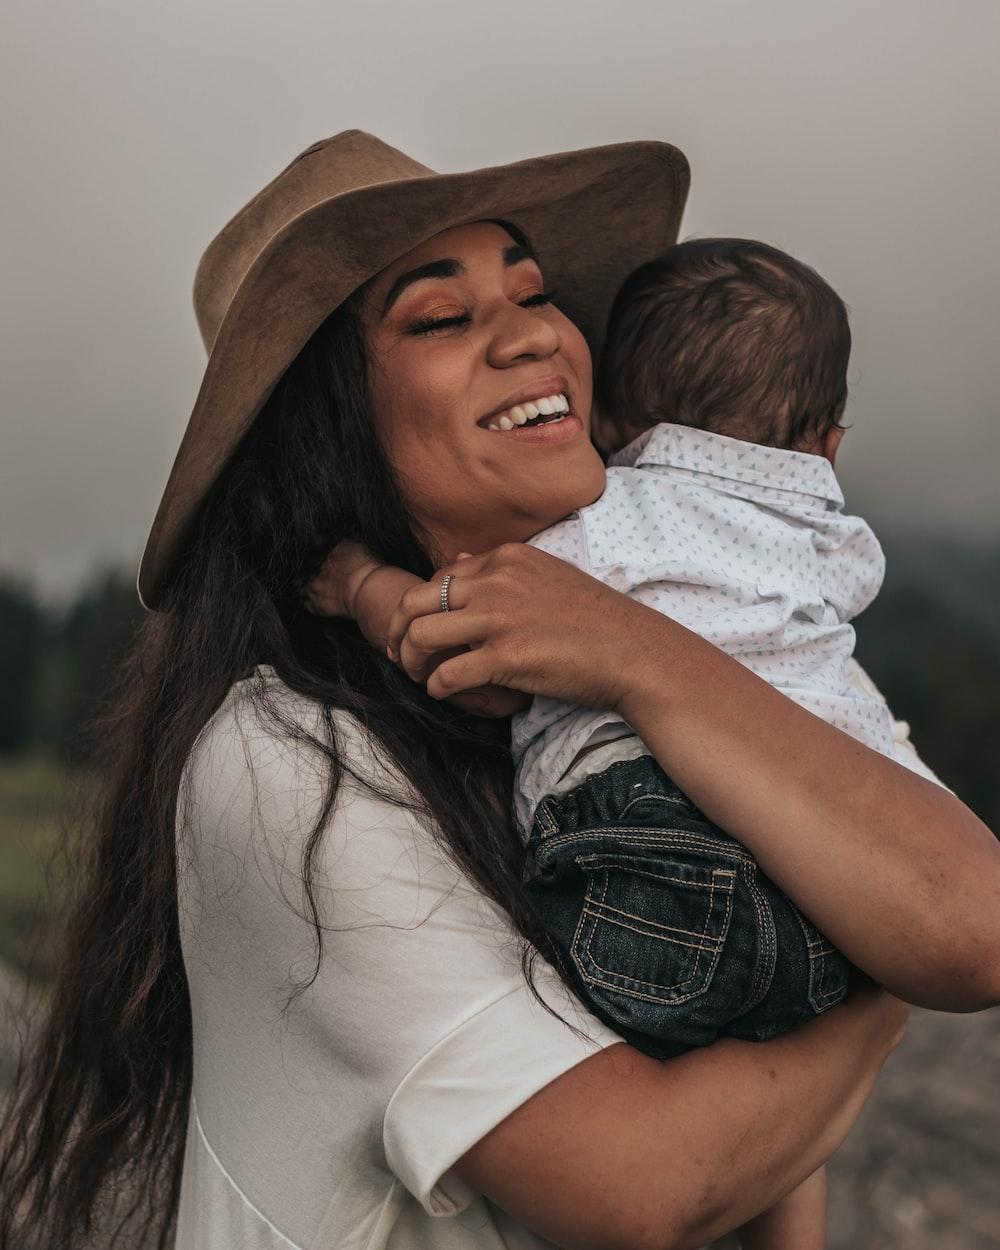 woman hugging baby